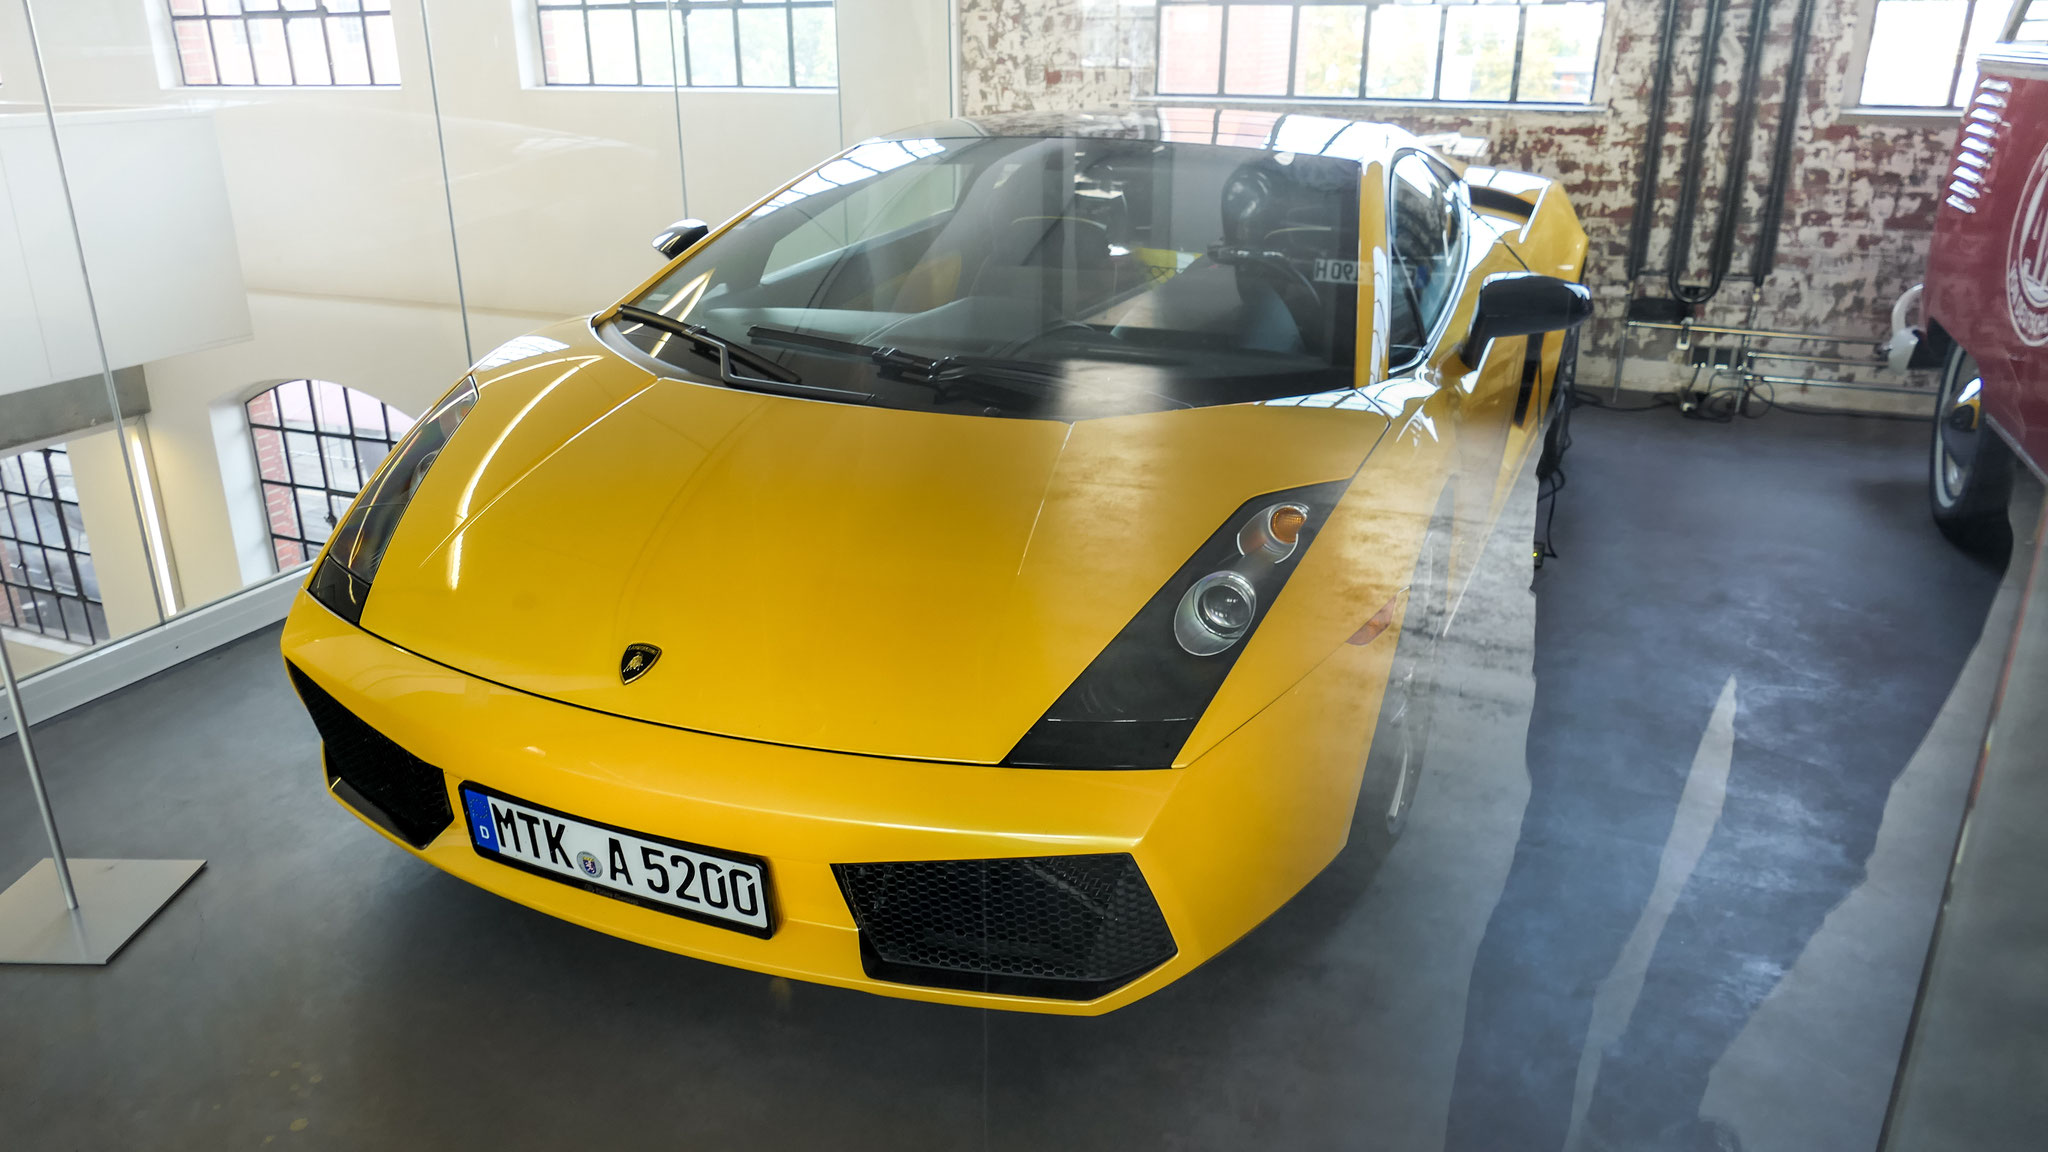 Lamborghini Gallardo - MTK-A-5200